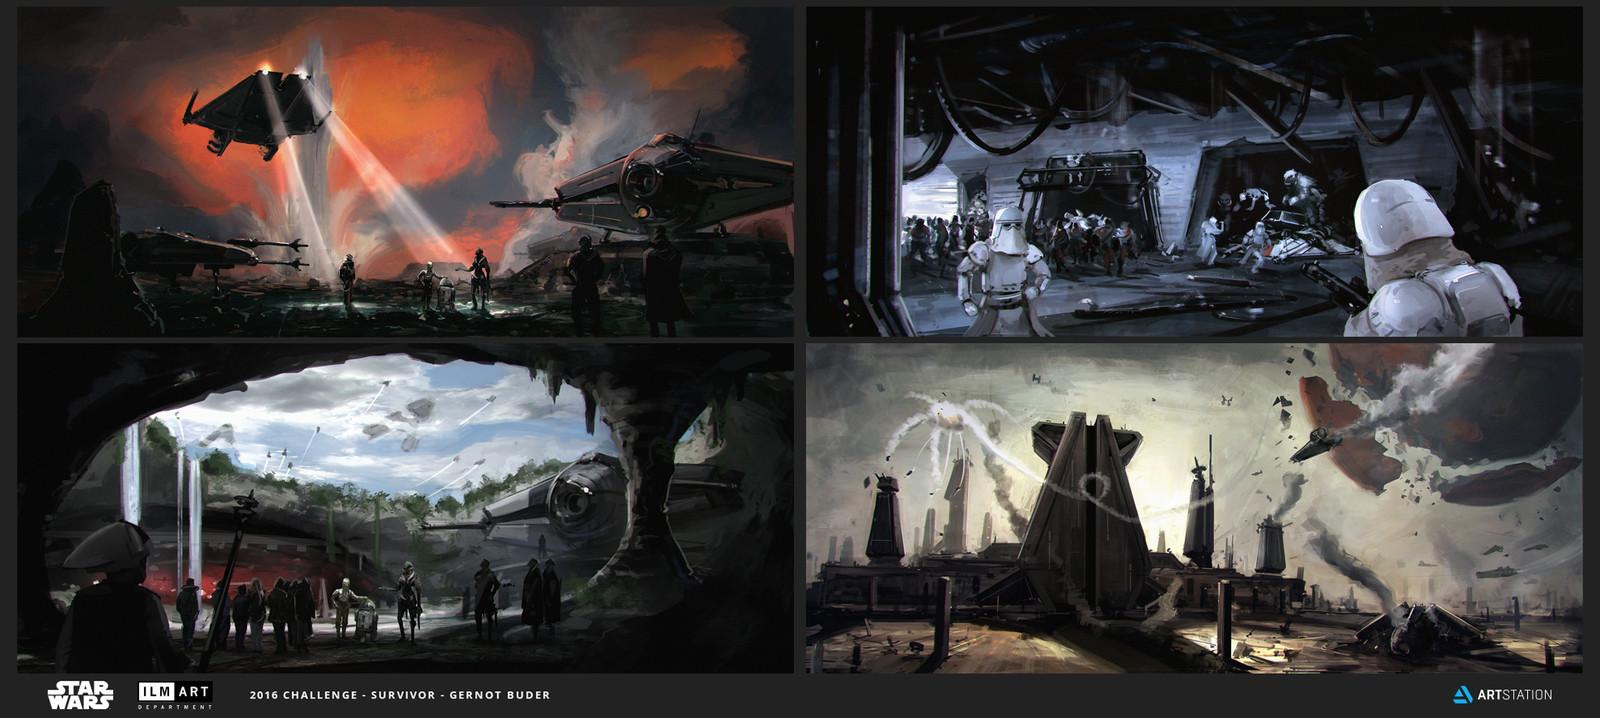 ILM Art Department Challenge (multiple images)